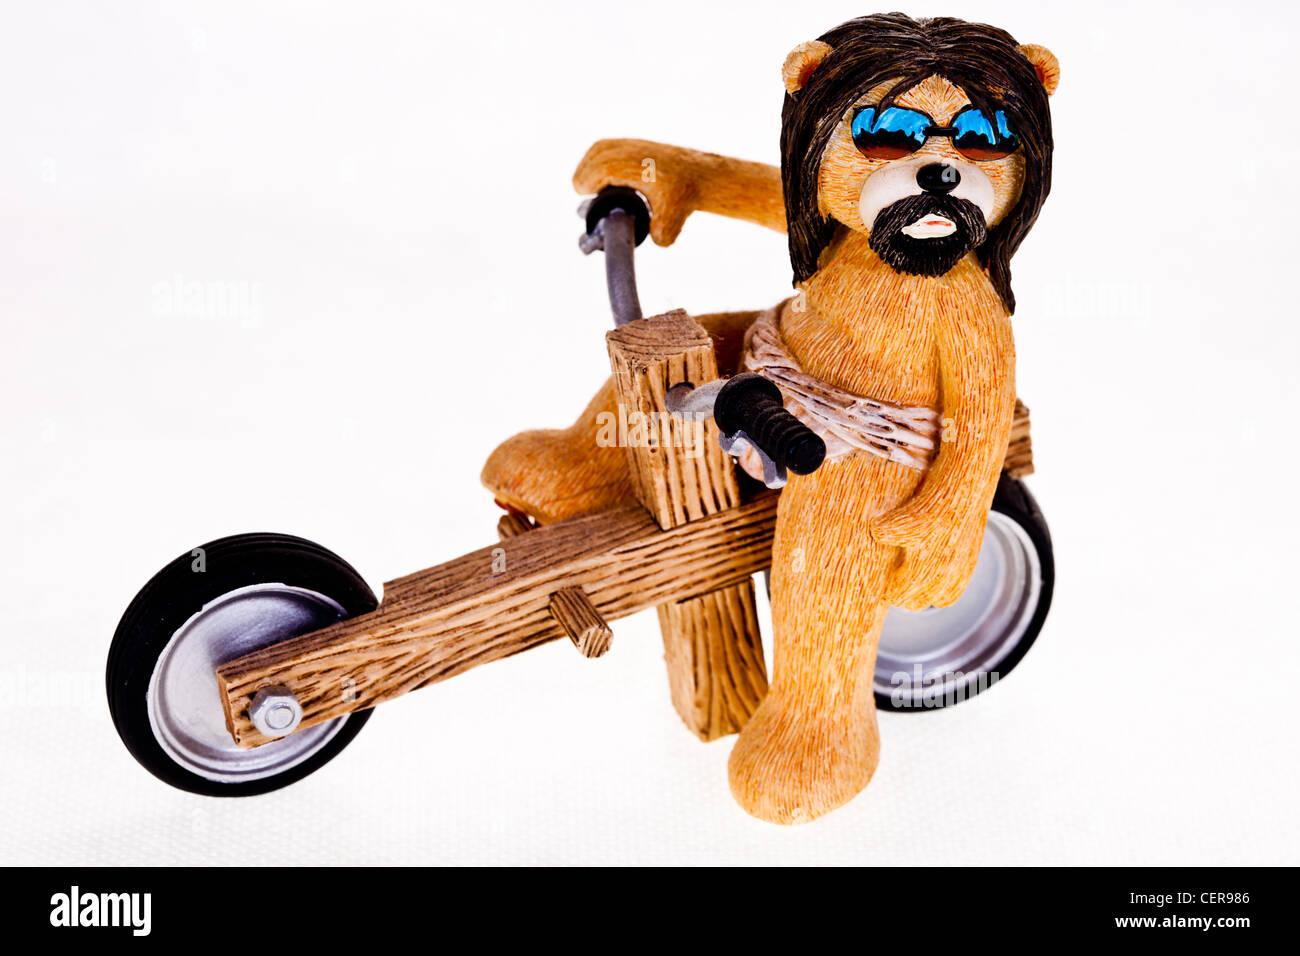 Harley David son of God,caricature of jesus as a biker,christian biker,bad taste bear,cool biker, - Stock Image